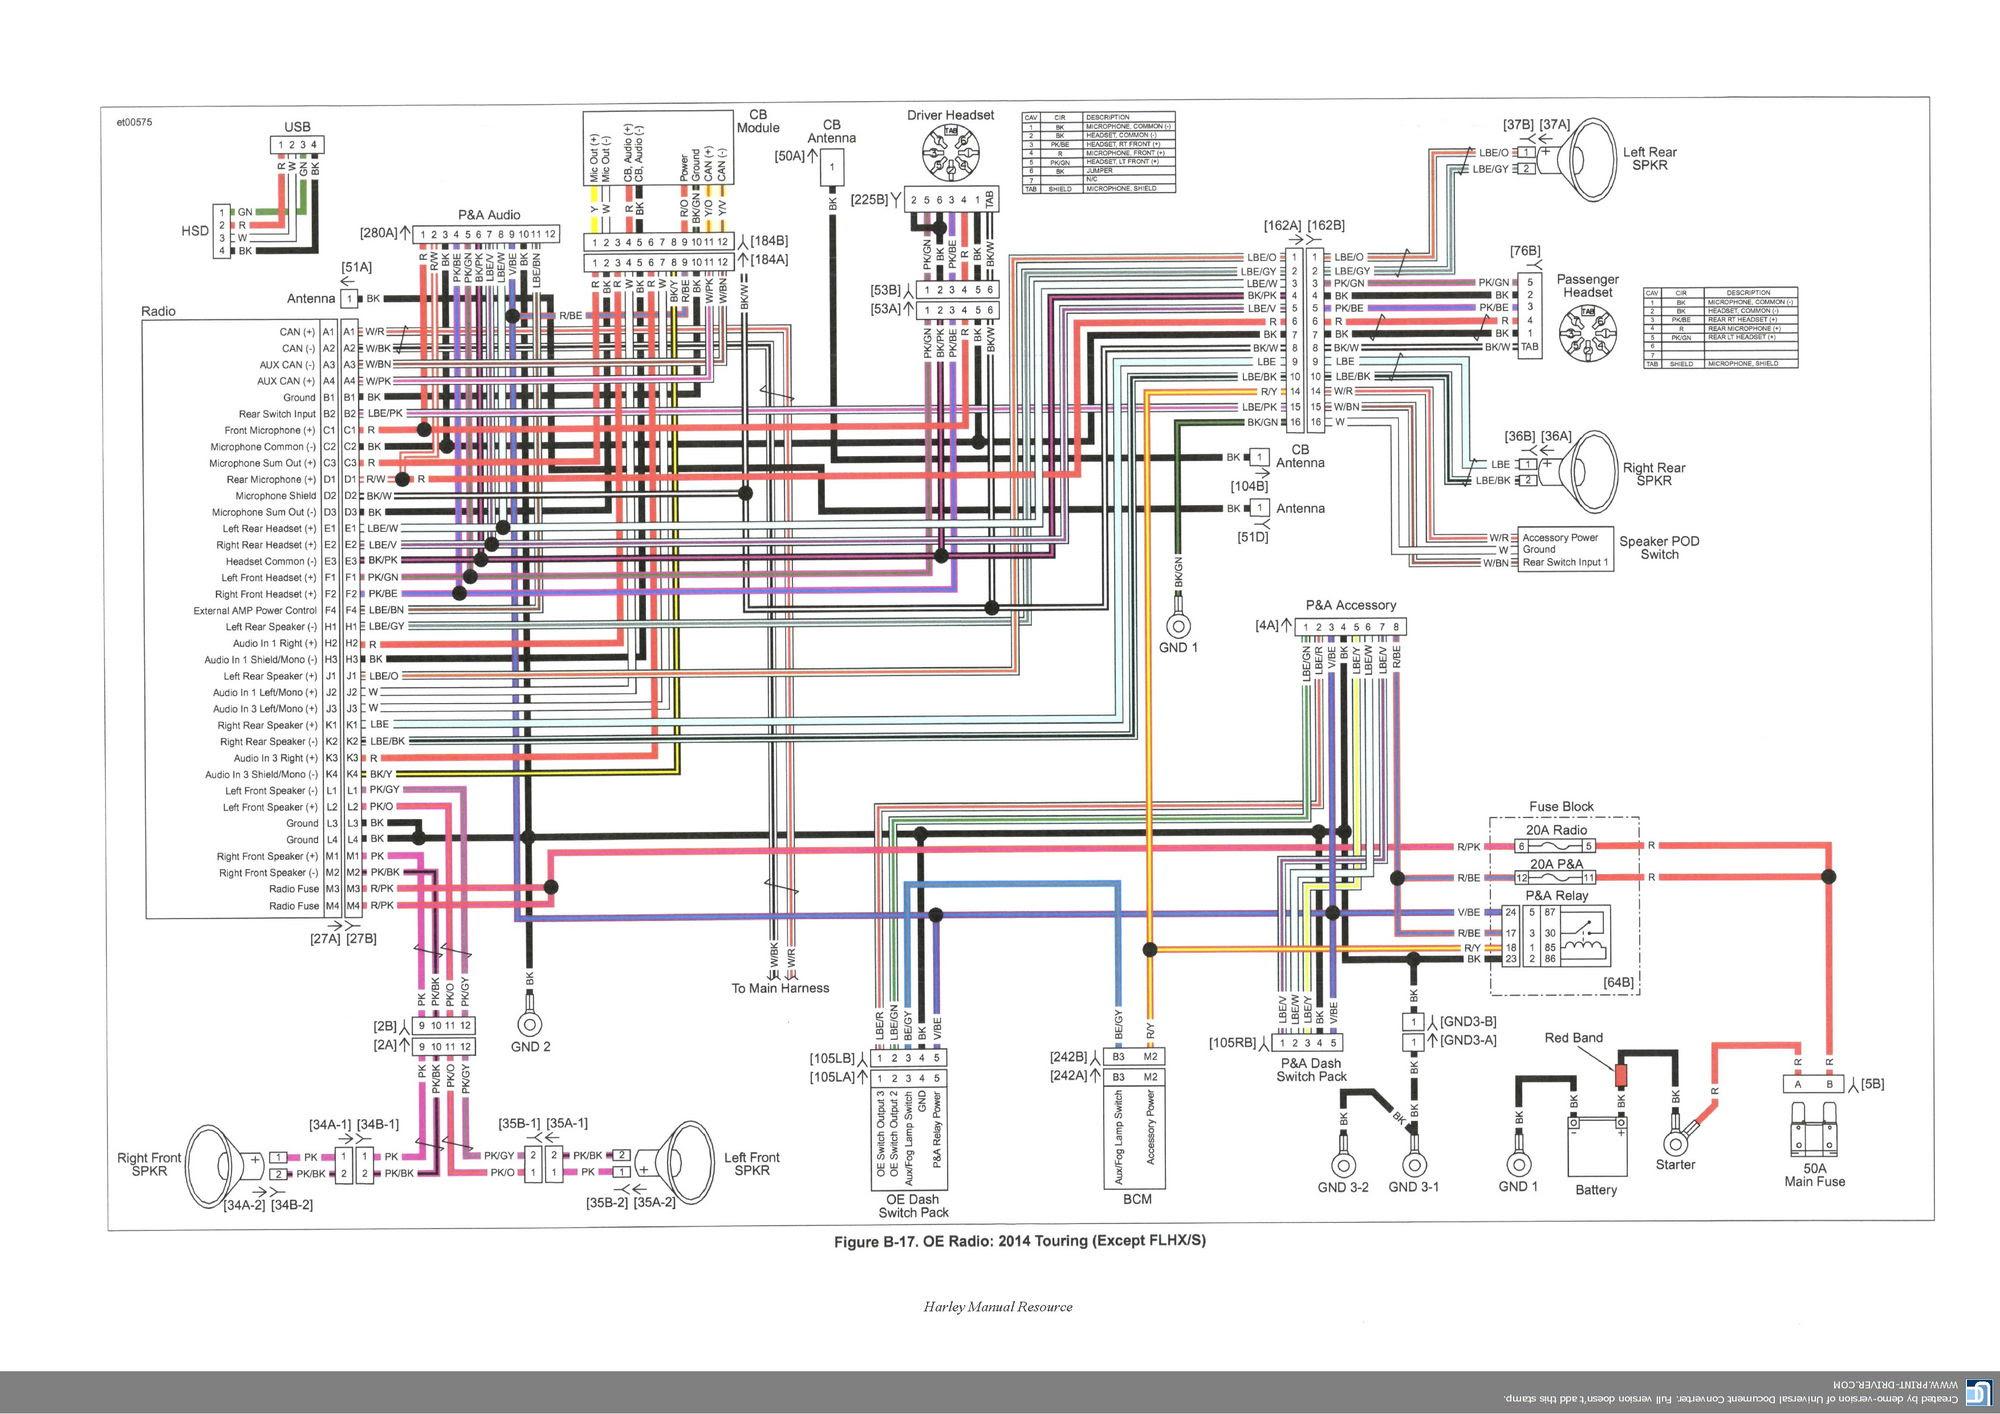 2011 Harley Davidson Wiring Diagrams Wiring Diagram Lock Explained Lock Explained Gobep It